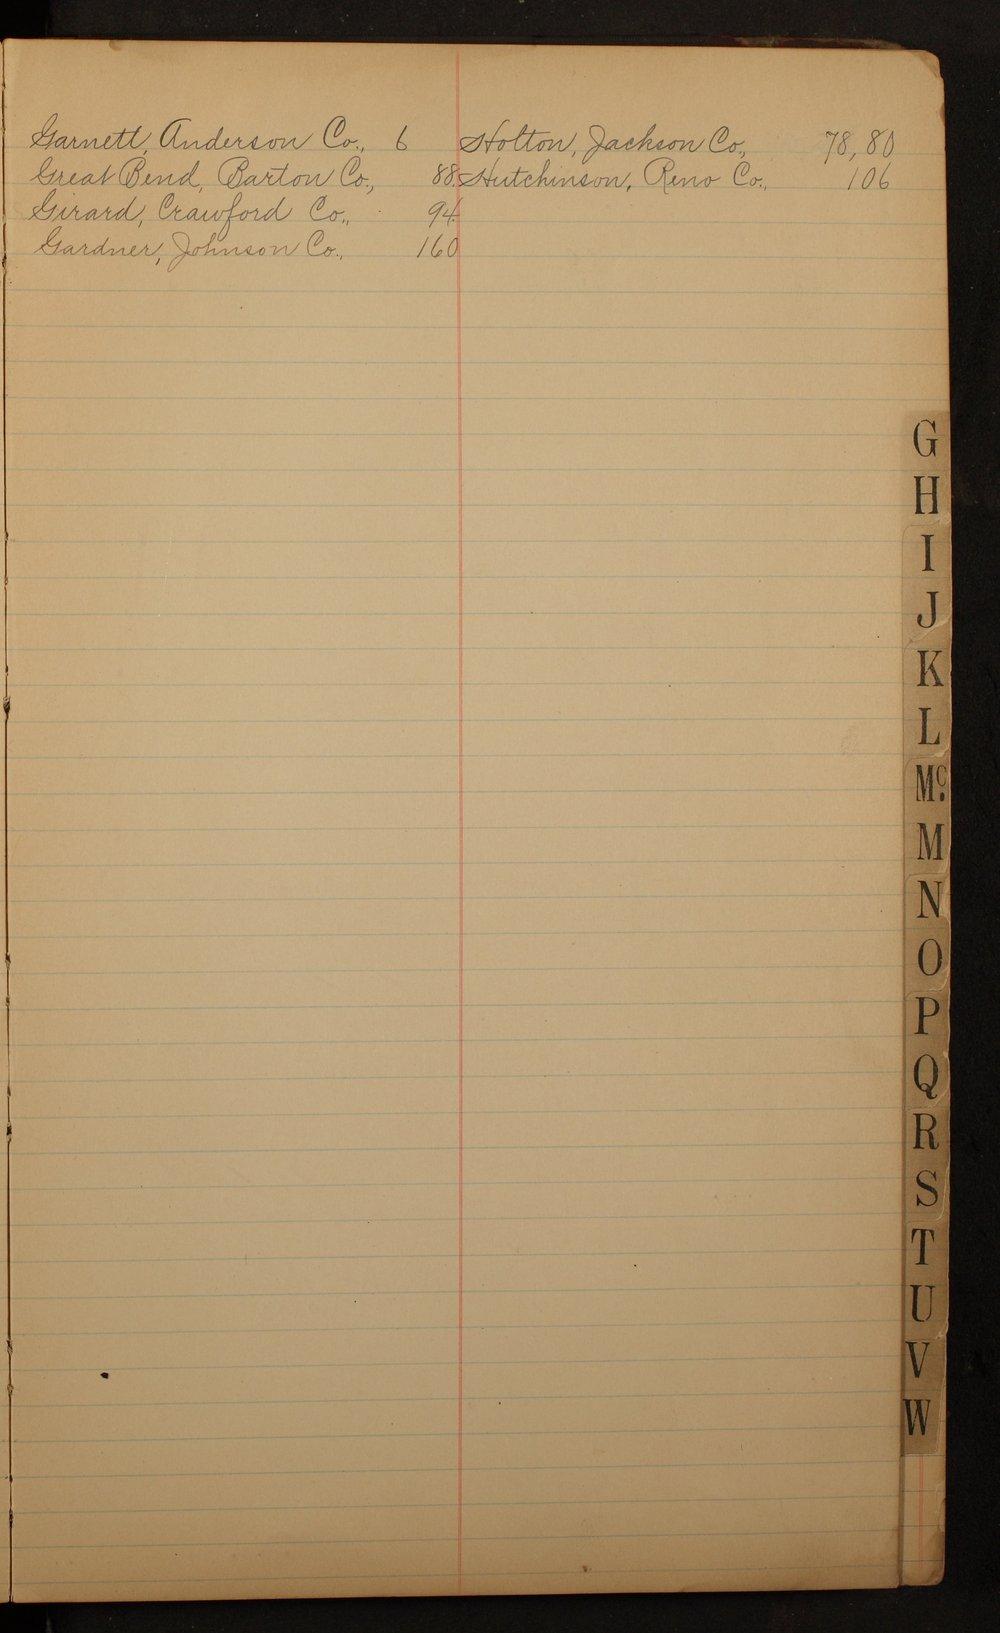 Kansas State Temperance Union expense journals - Index G-H